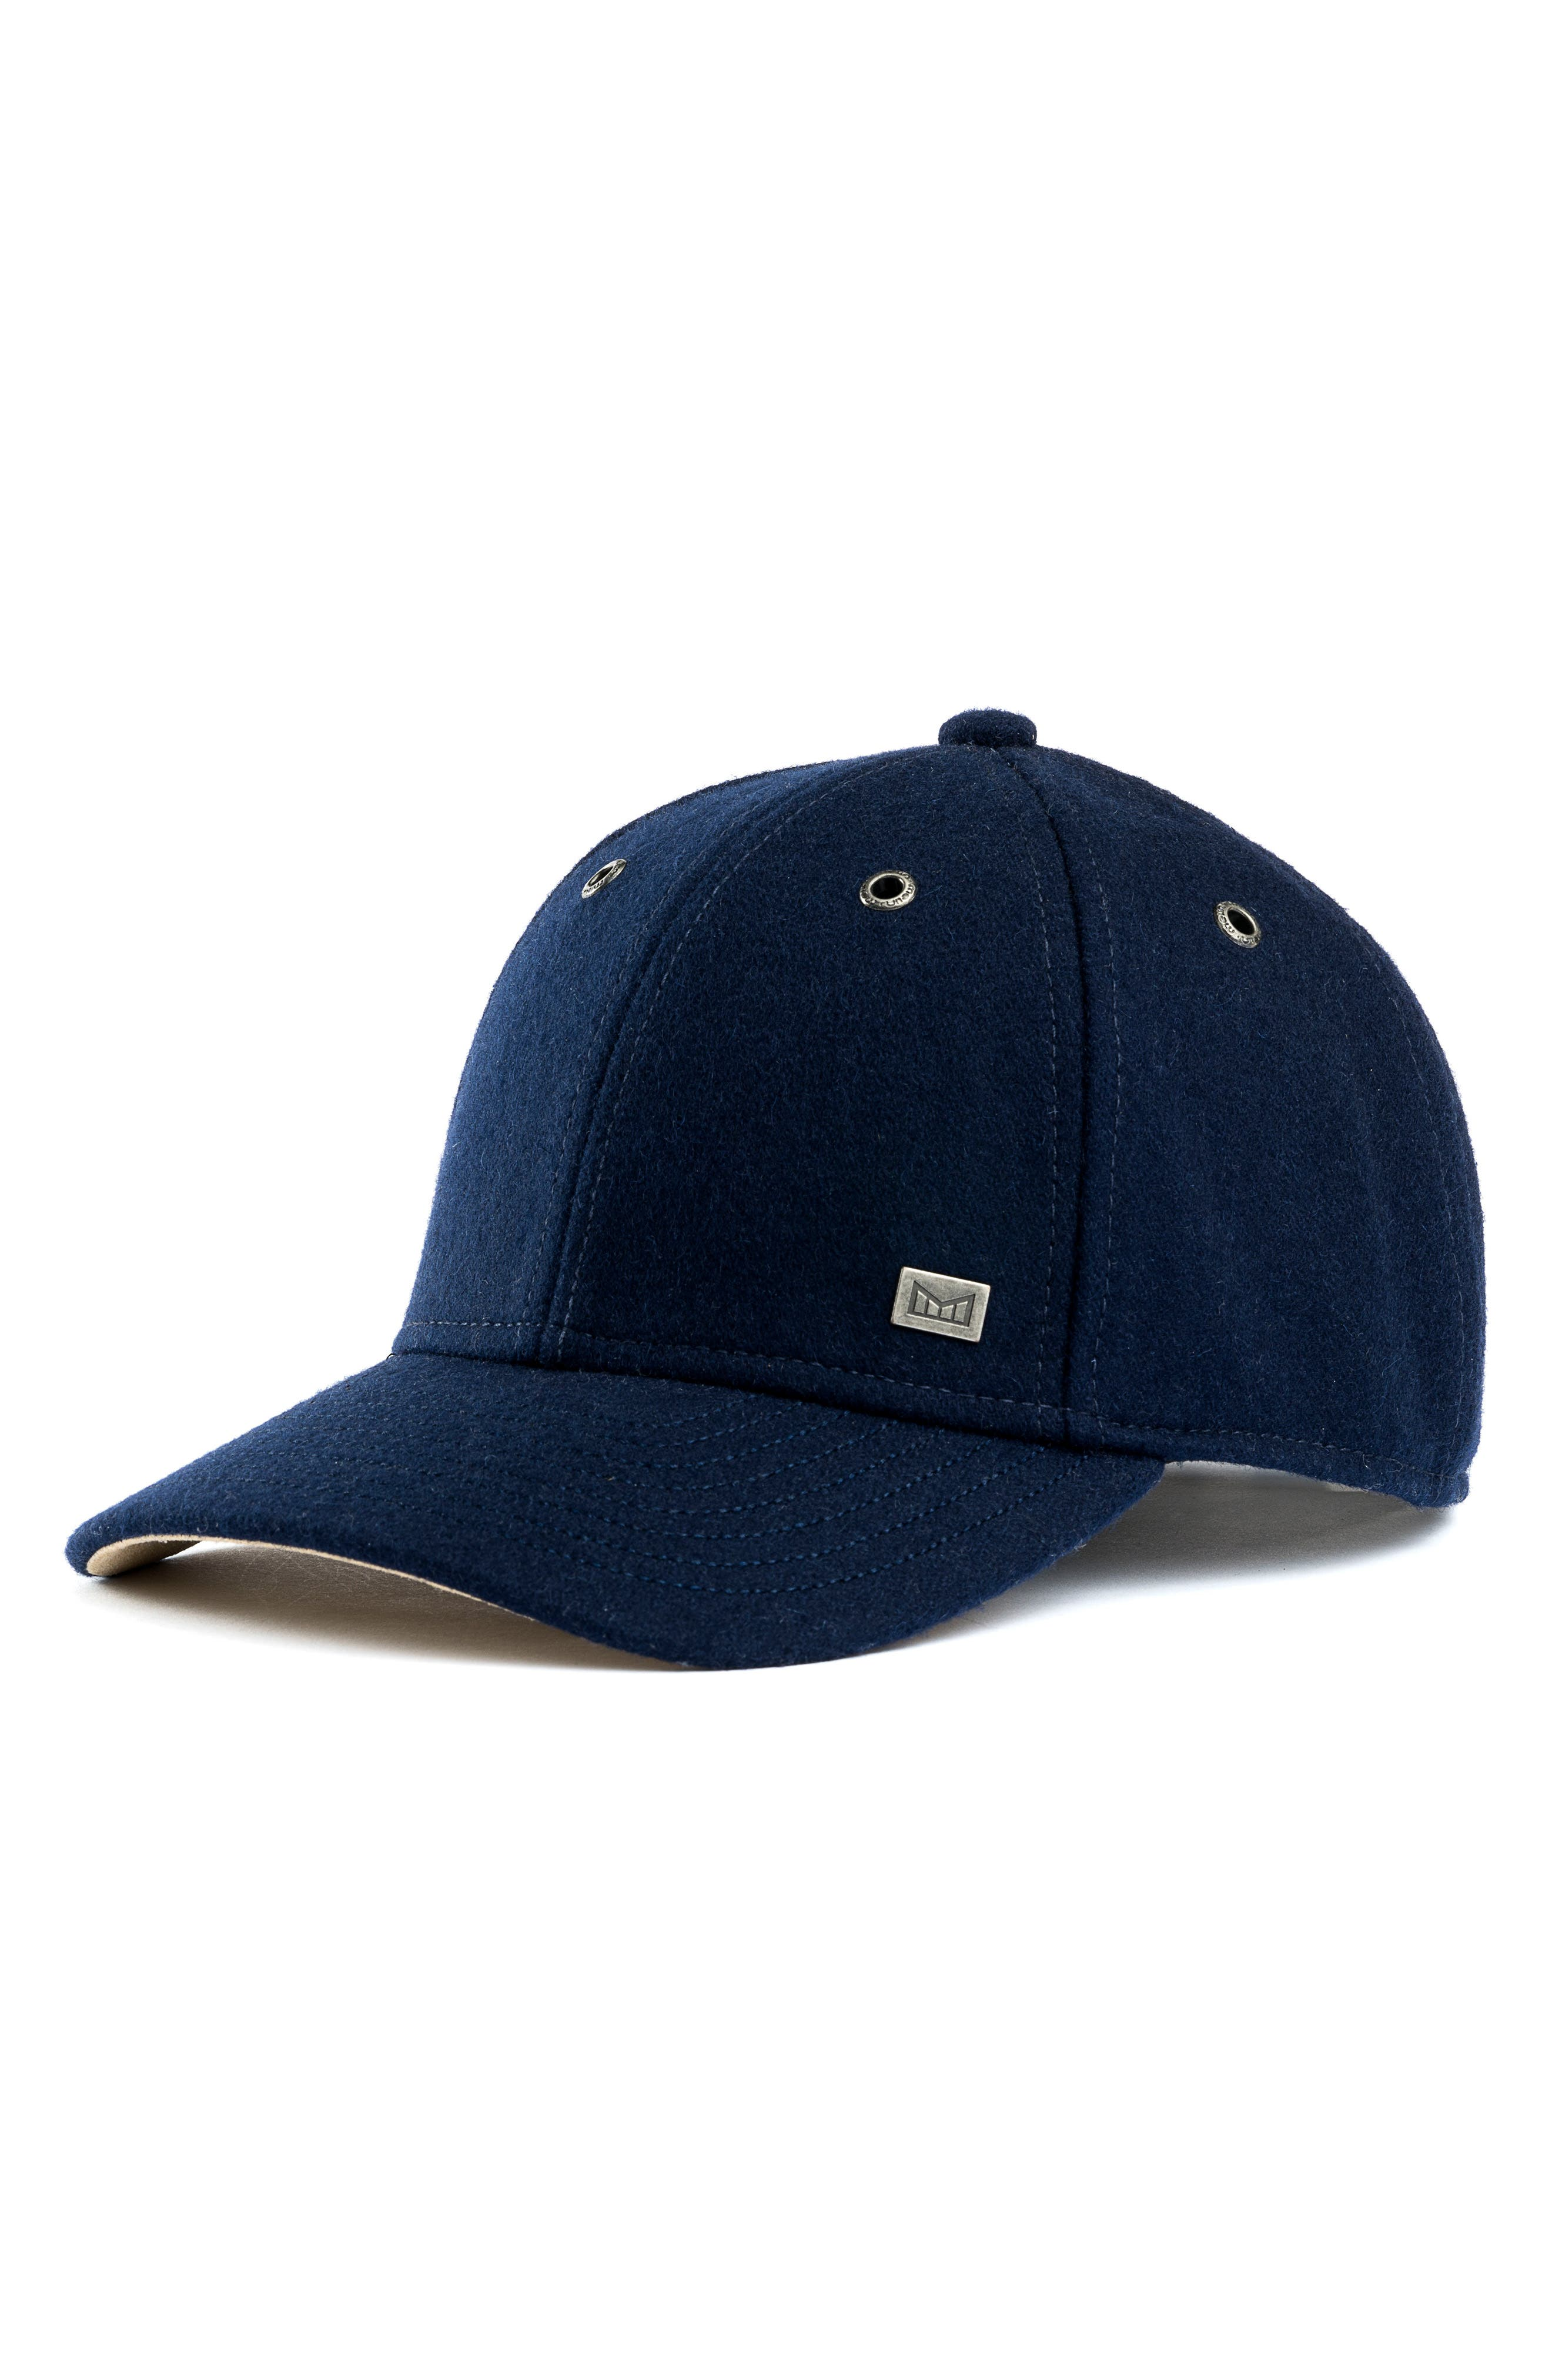 Midnight Baseball Cap,                             Main thumbnail 1, color,                             NAVY